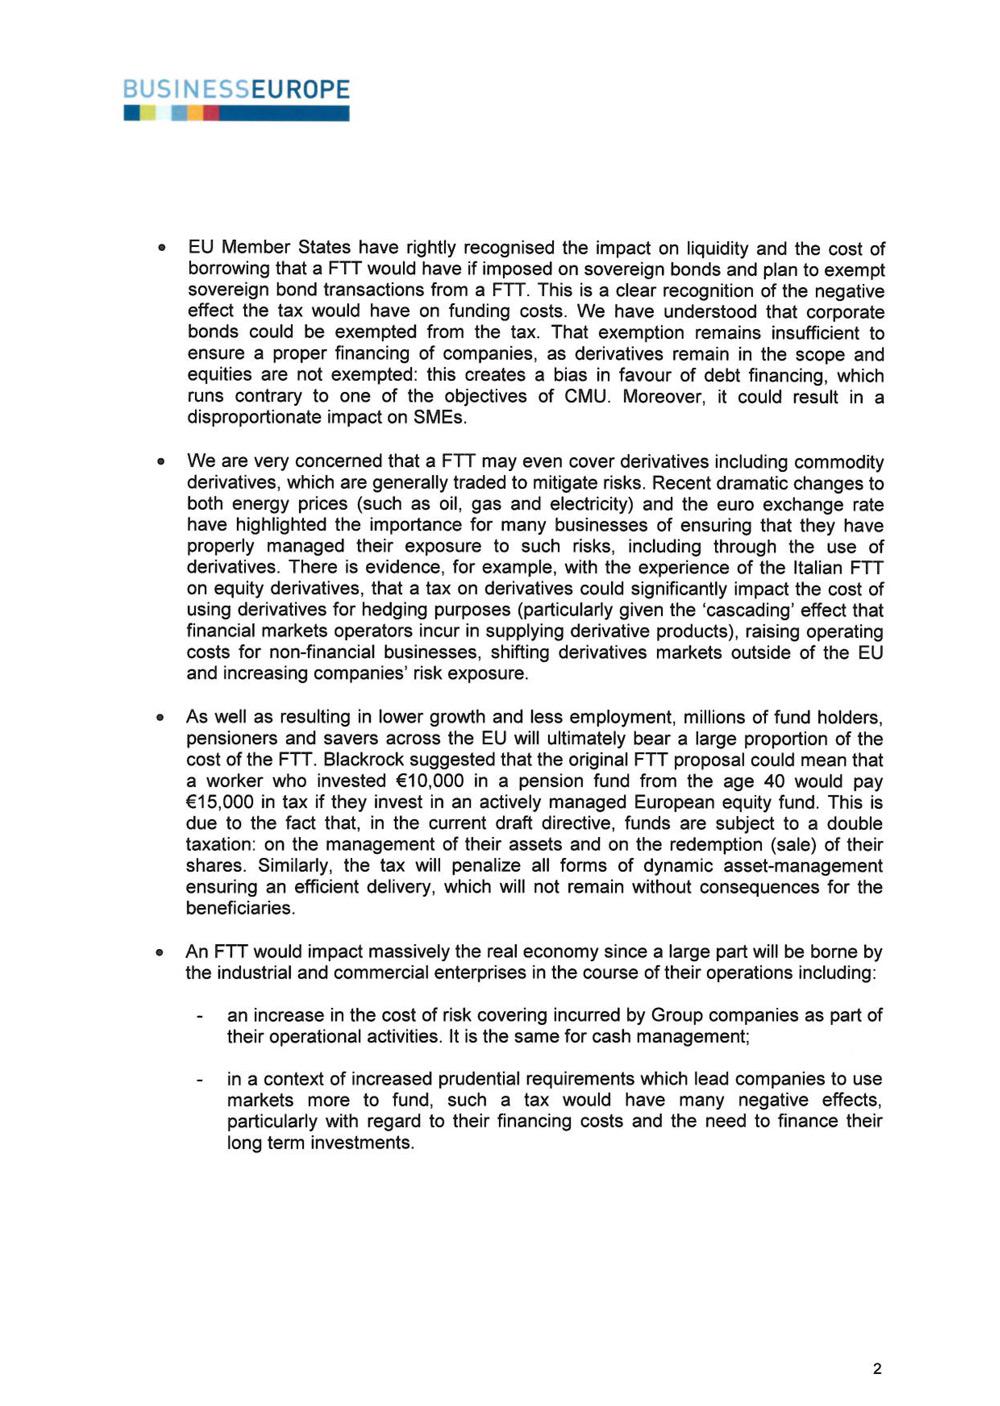 2015-11-06-Letter-on-FTT-to-ECOFIN-Council-November---Min--Gramegna---LU-2